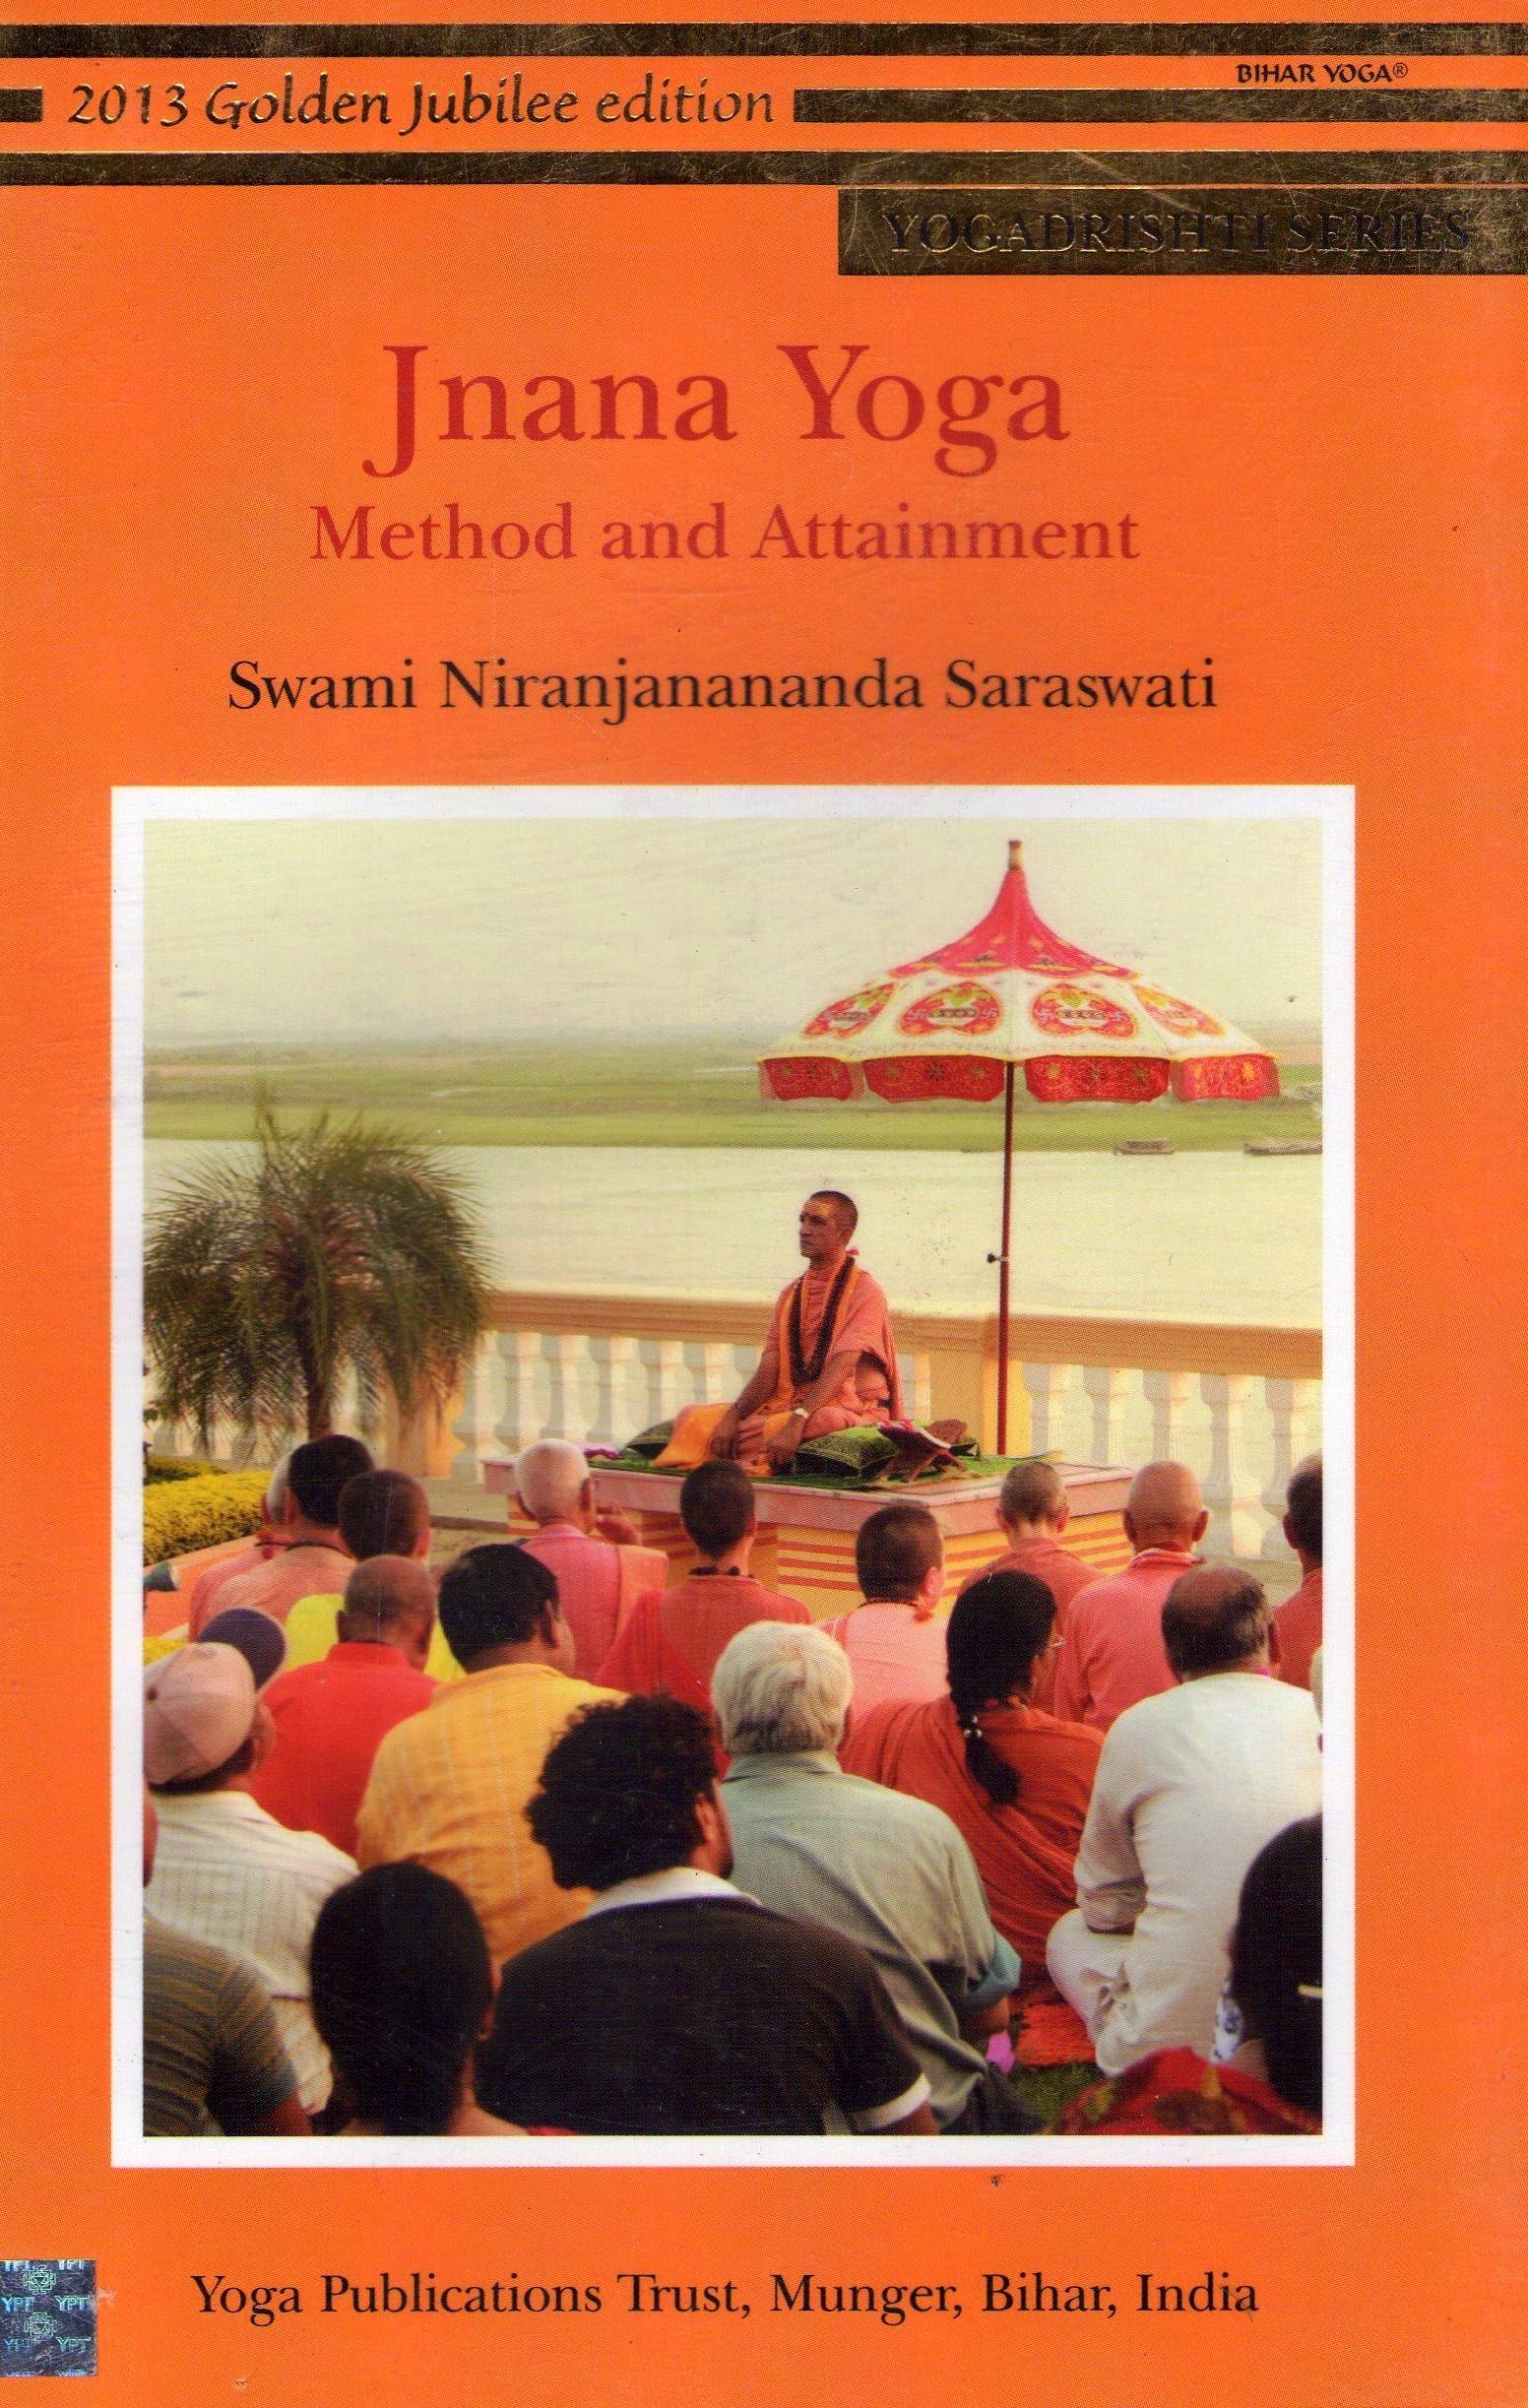 Jnana Yoga: Method and Attainment: Amazon.es: Swami ...